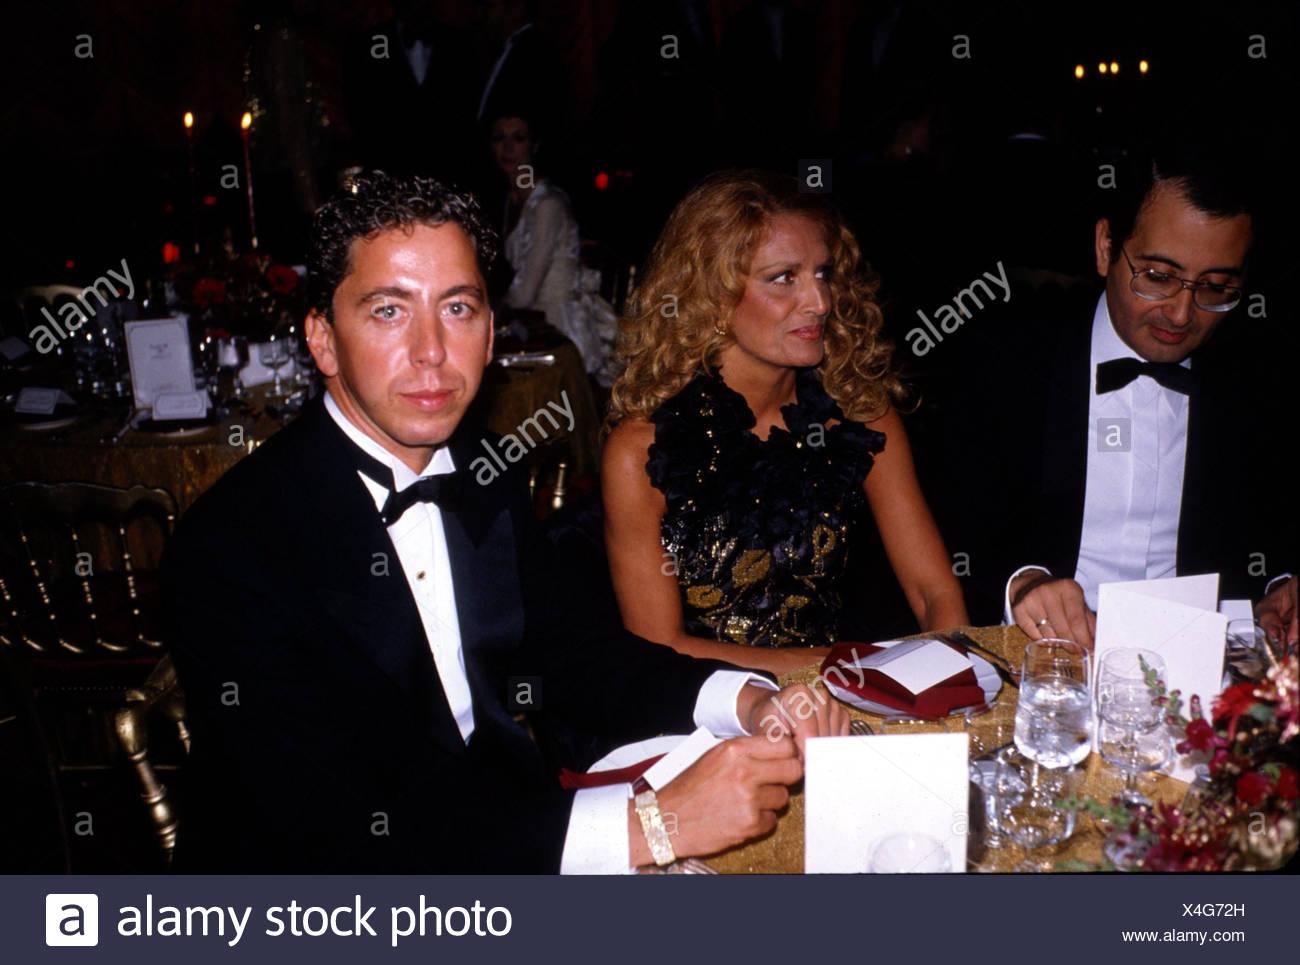 Dalida (Yolande Gigliotti), 17.1.1933 - 3.5.1987, Italian Schlager singer, half length, sitting at table, 1980s, elegant, blond, - Stock Image